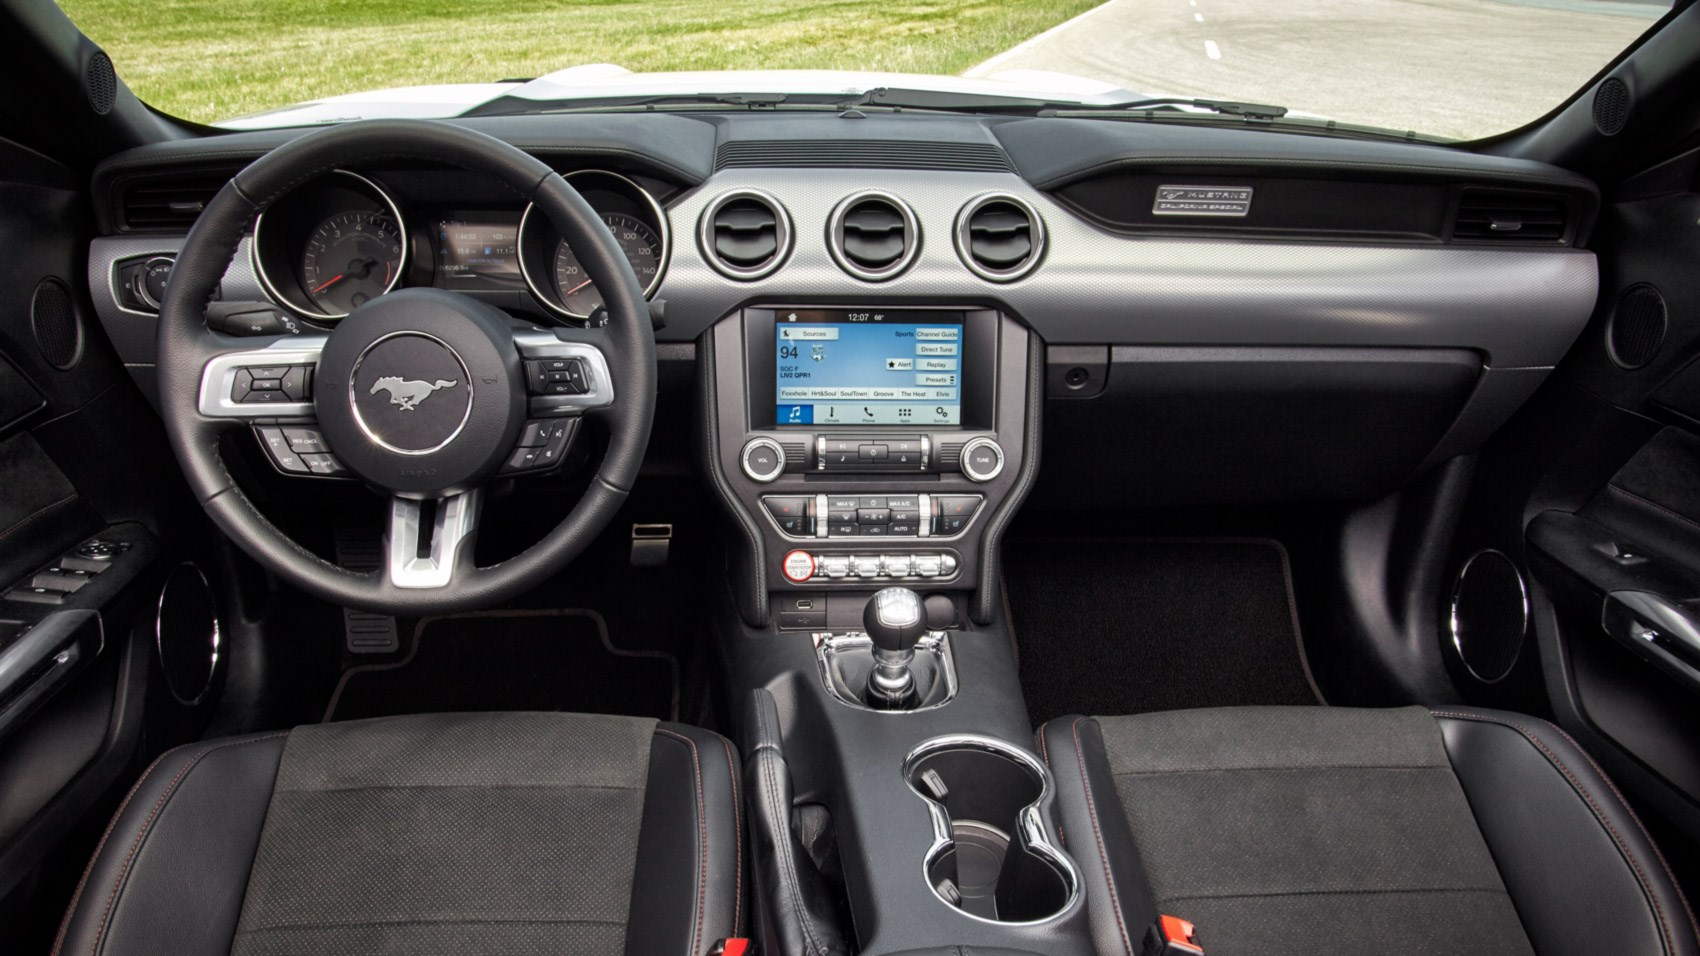 Ford mustang gt 5 0 v8